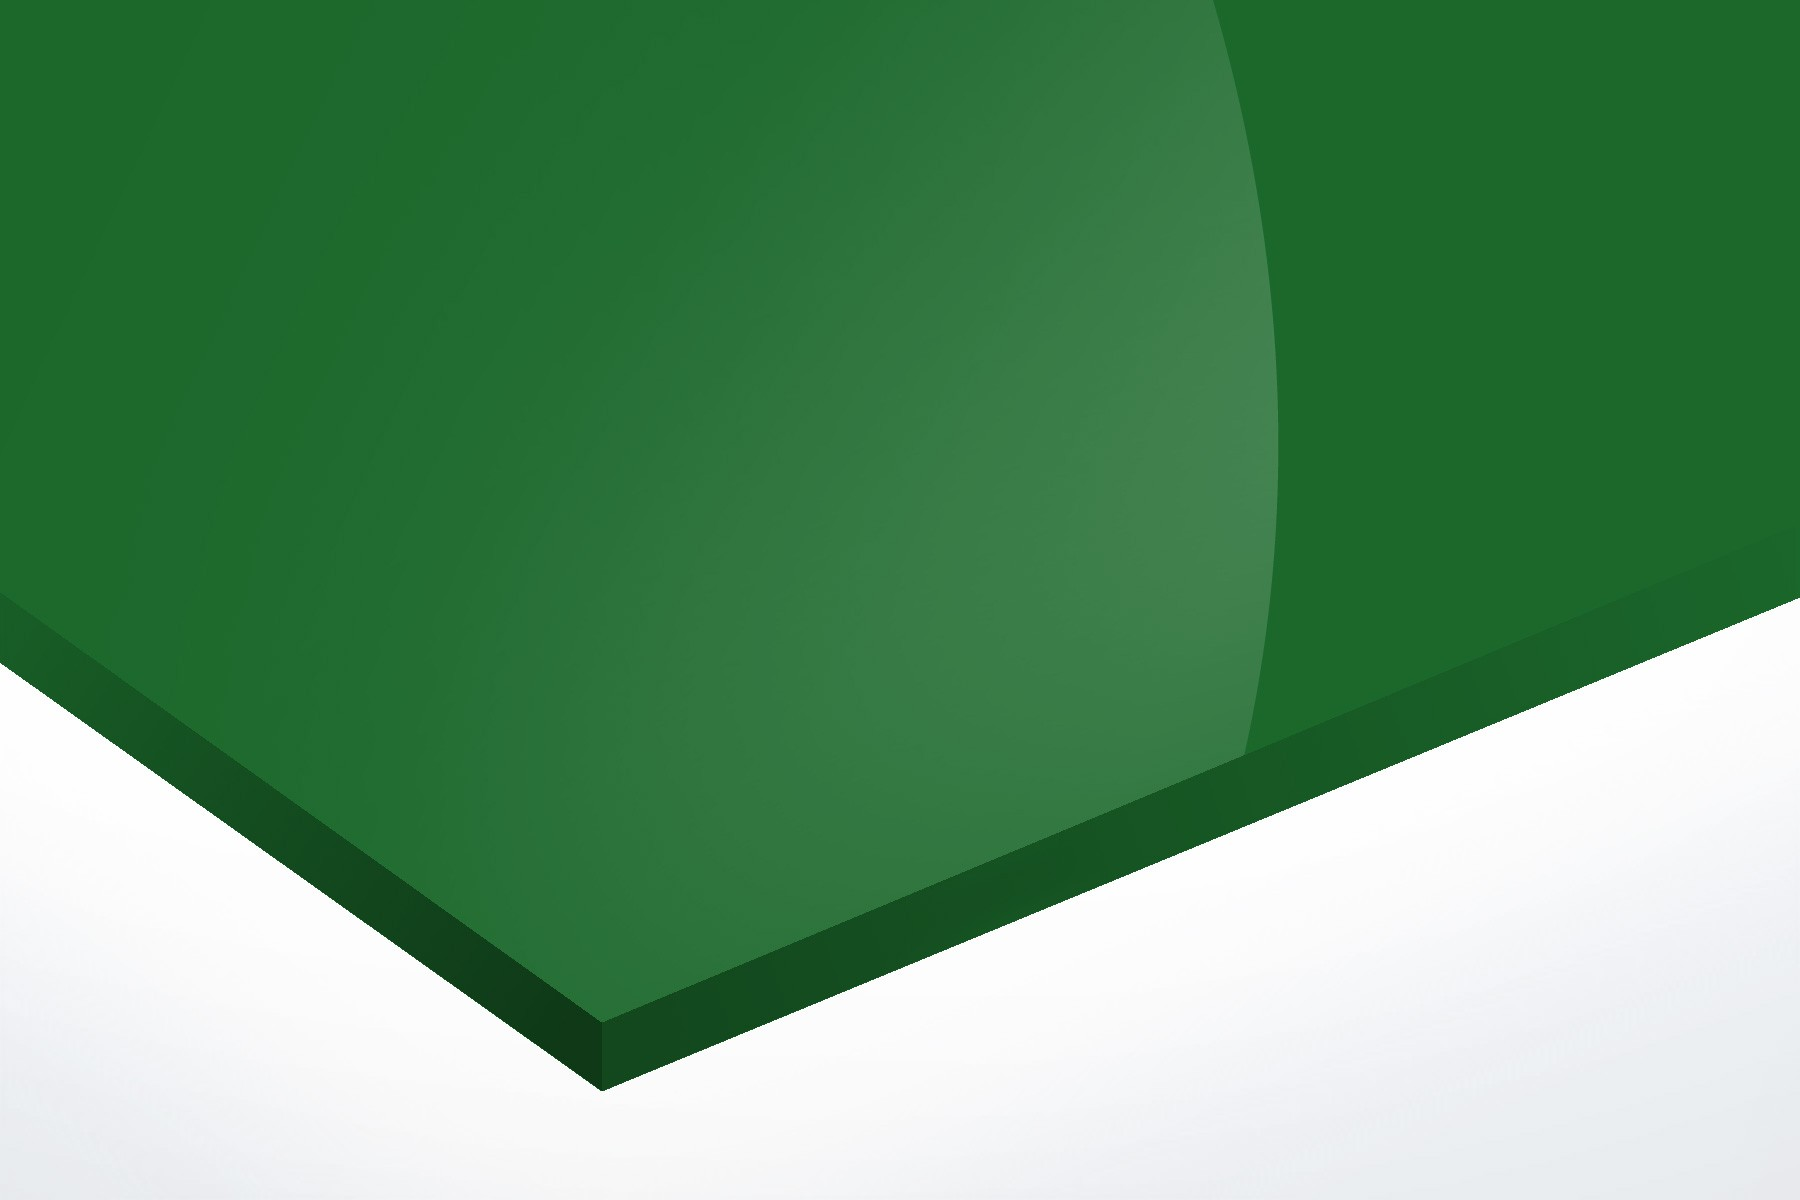 302/15/7097 Alu brillant Vert 1,5mm